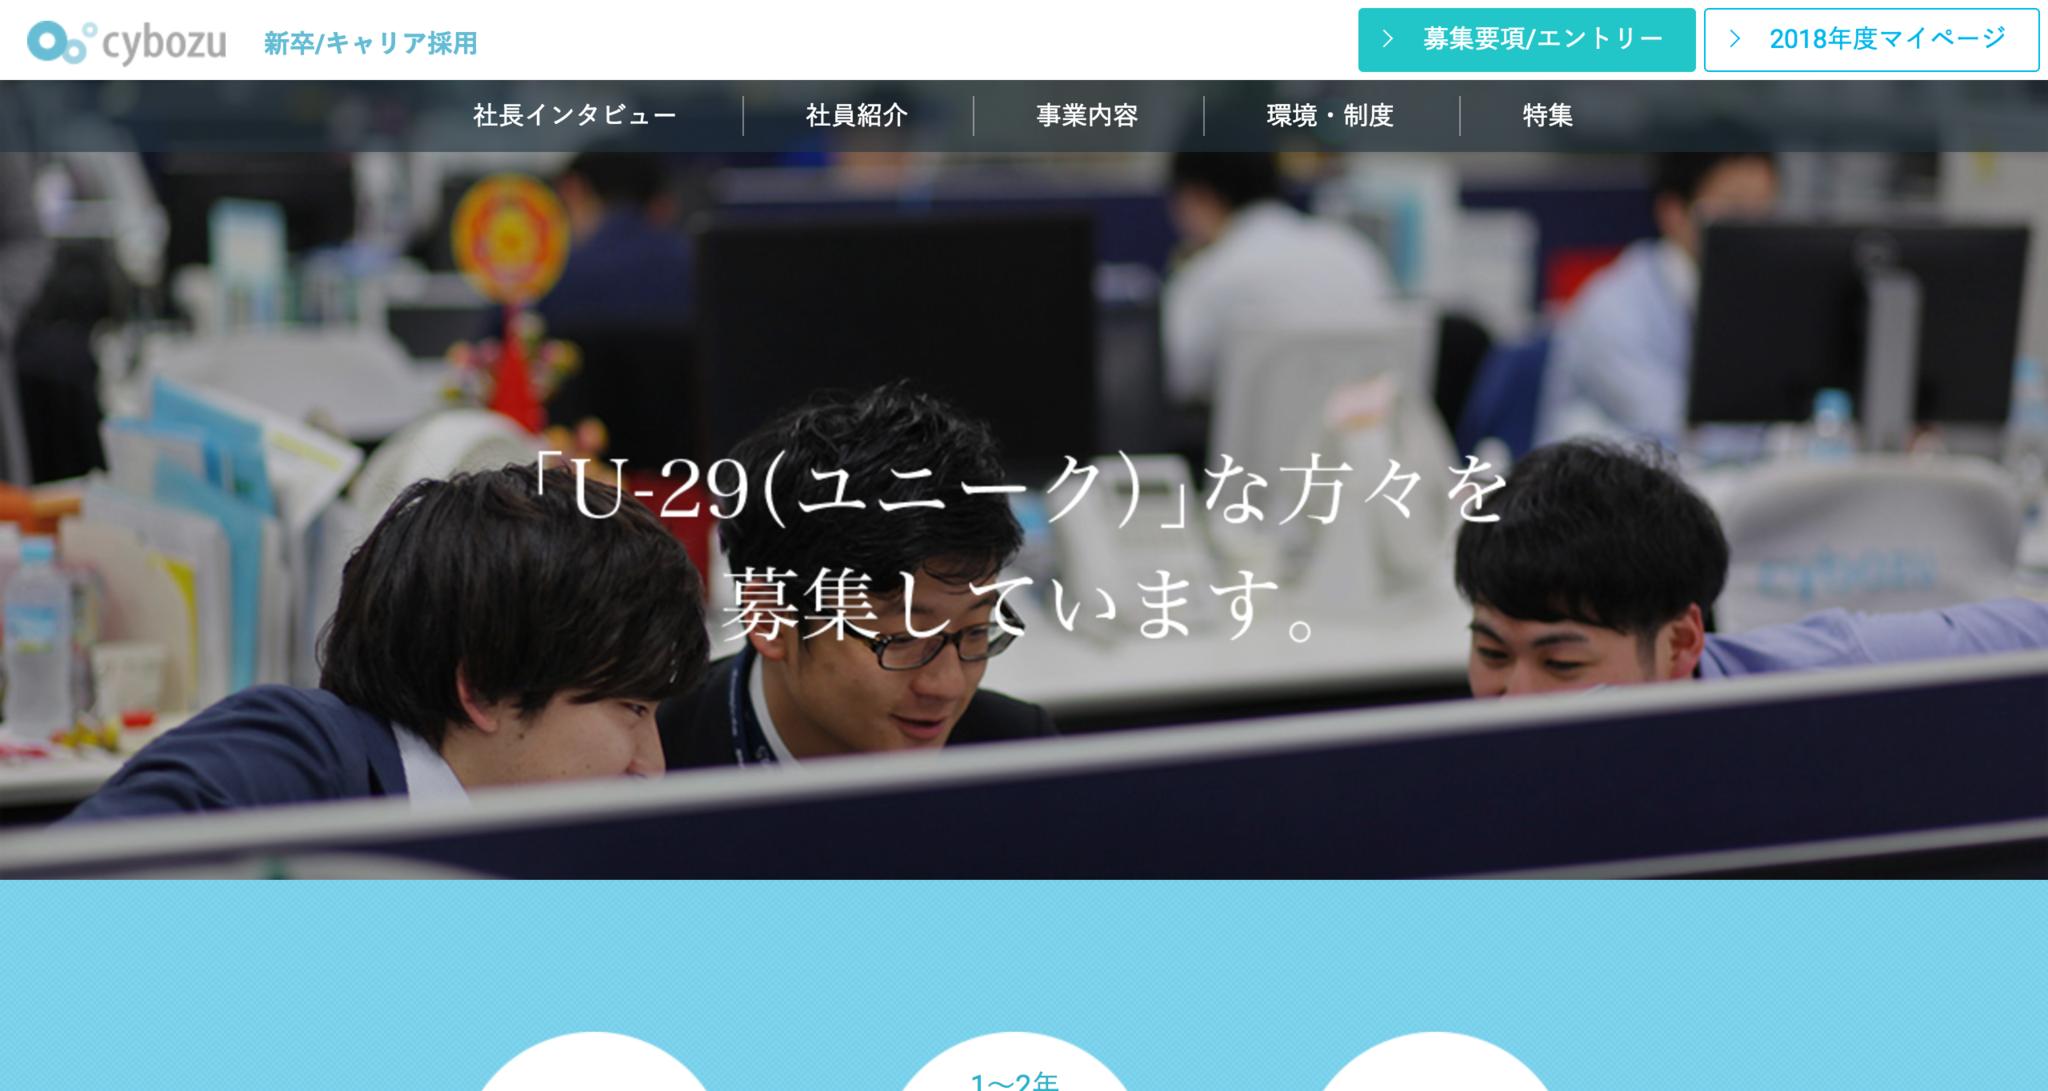 U_29(ユニーク)採用サイト___サイボウズ_採用情報(新卒・キャリア).png